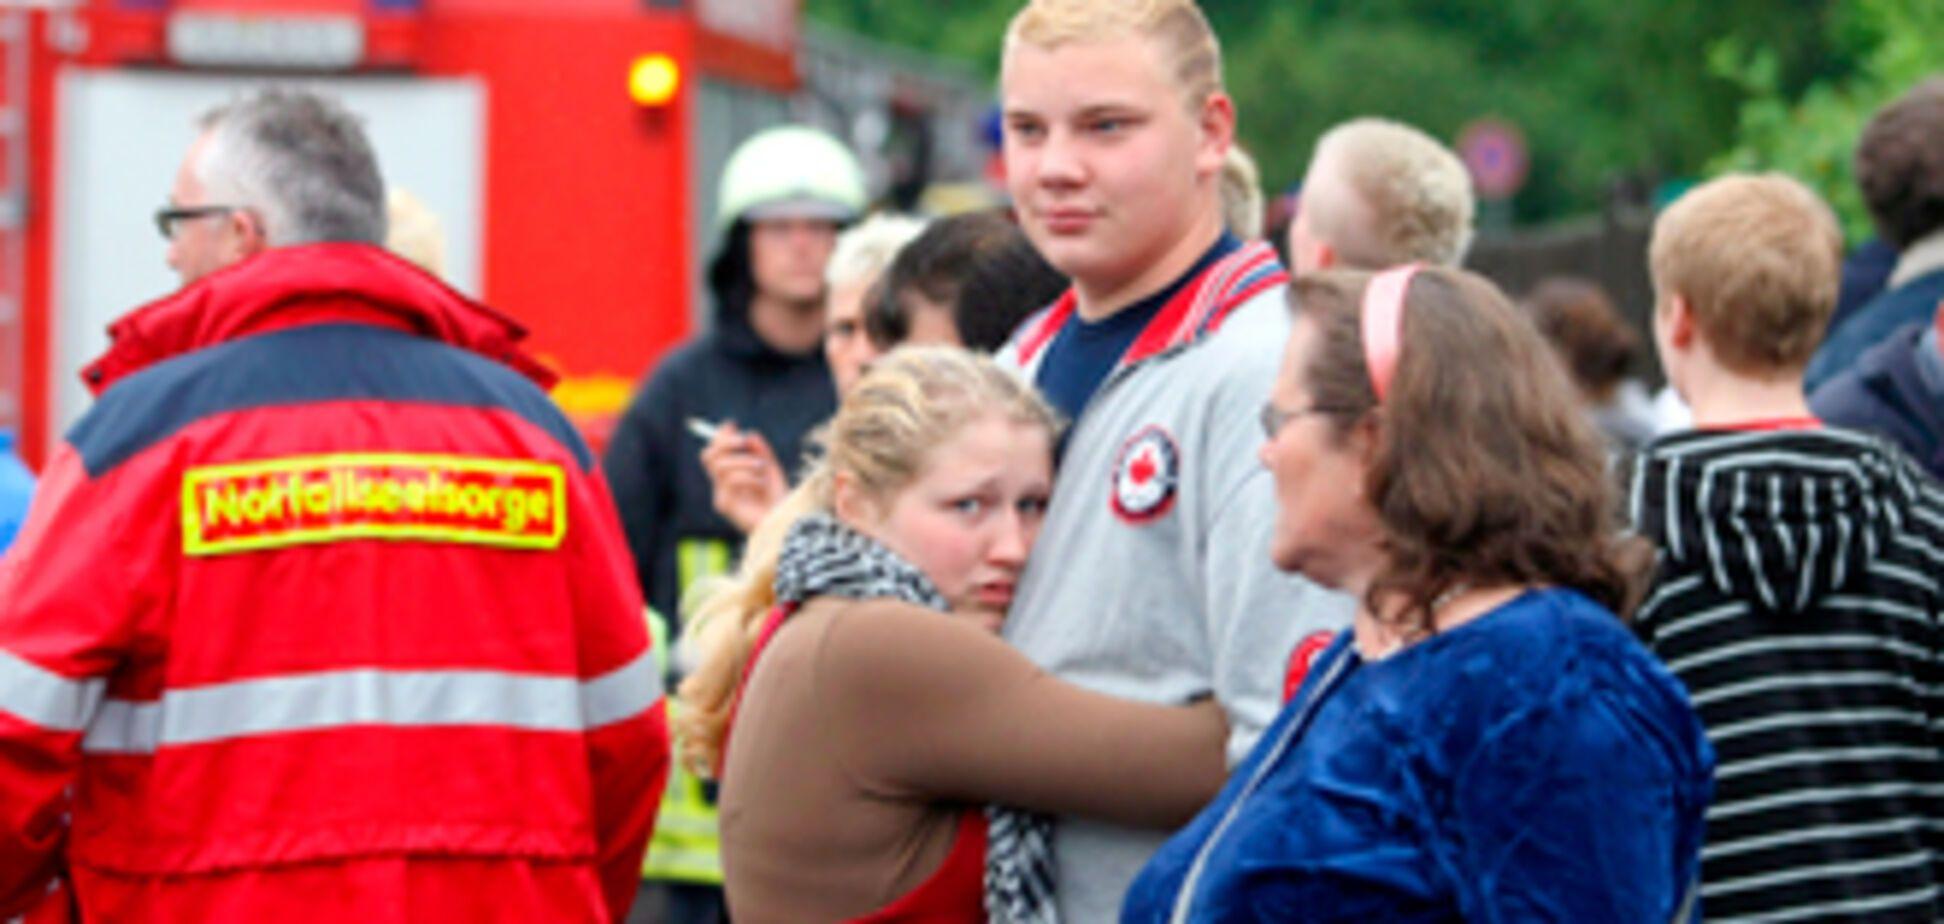 Напавшая на немецкую школу украинка задержана